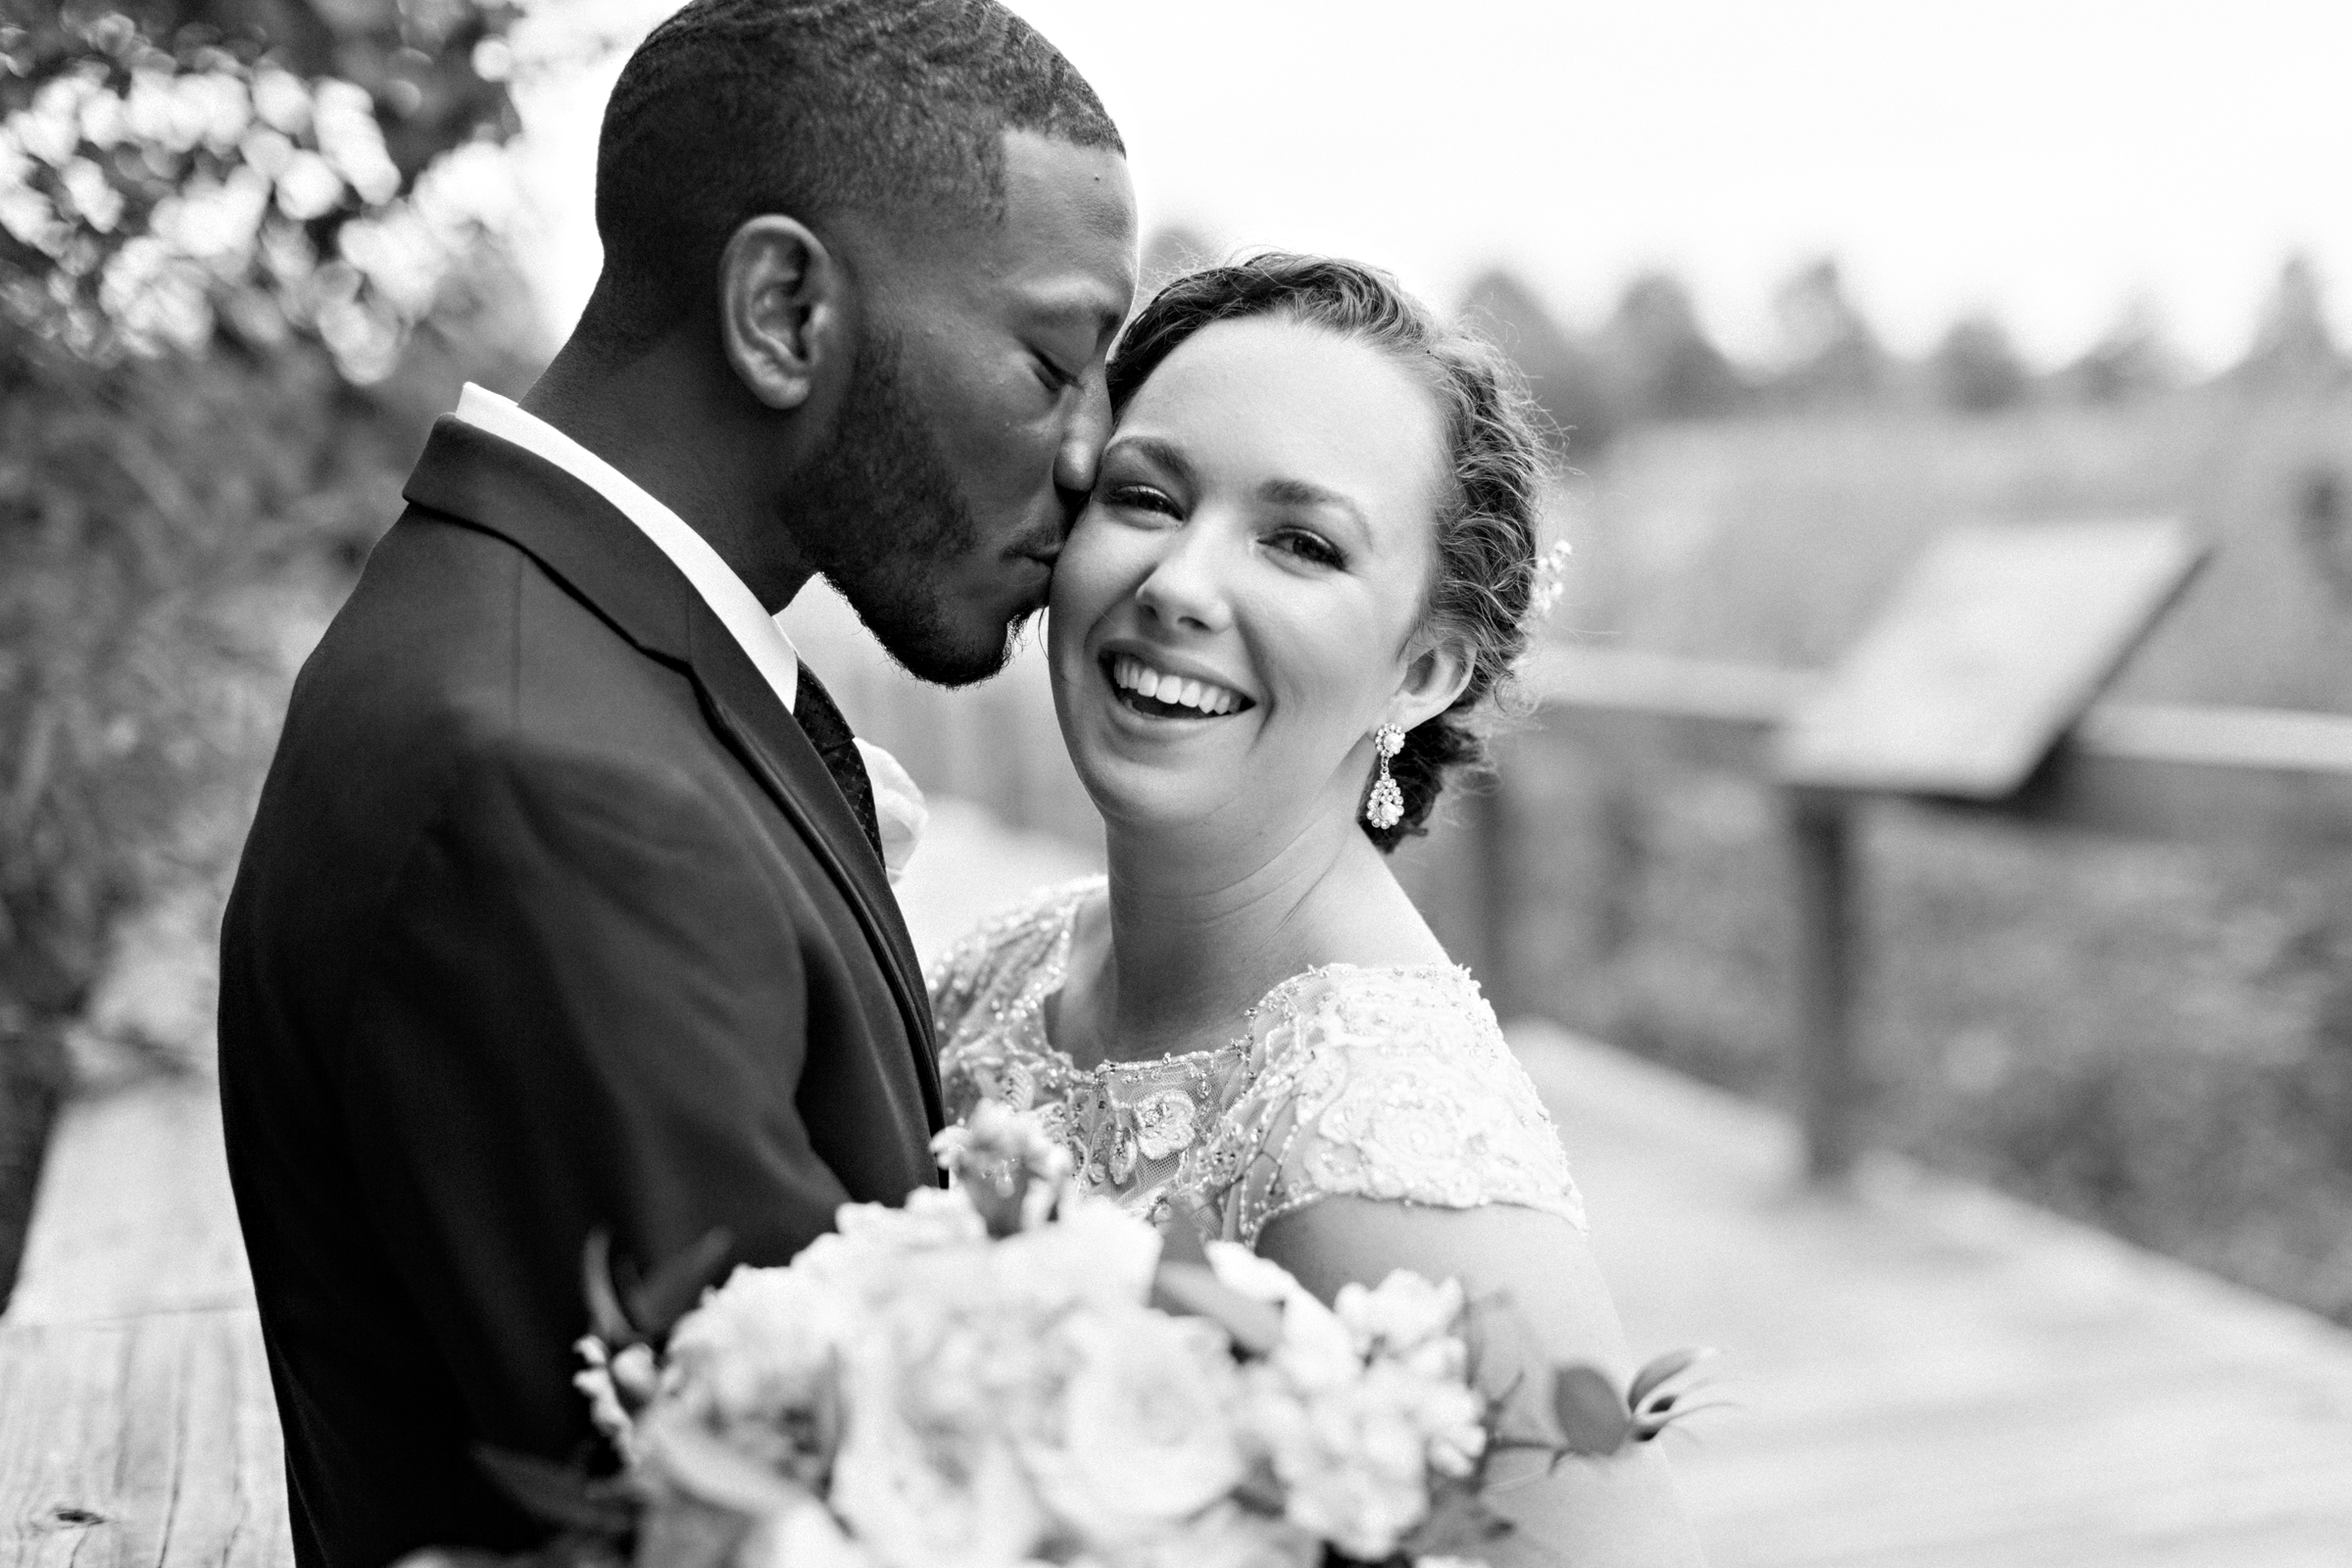 Alabama-Wedding-Photography-Nick-Drollette-Cory-Laura-136.jpg